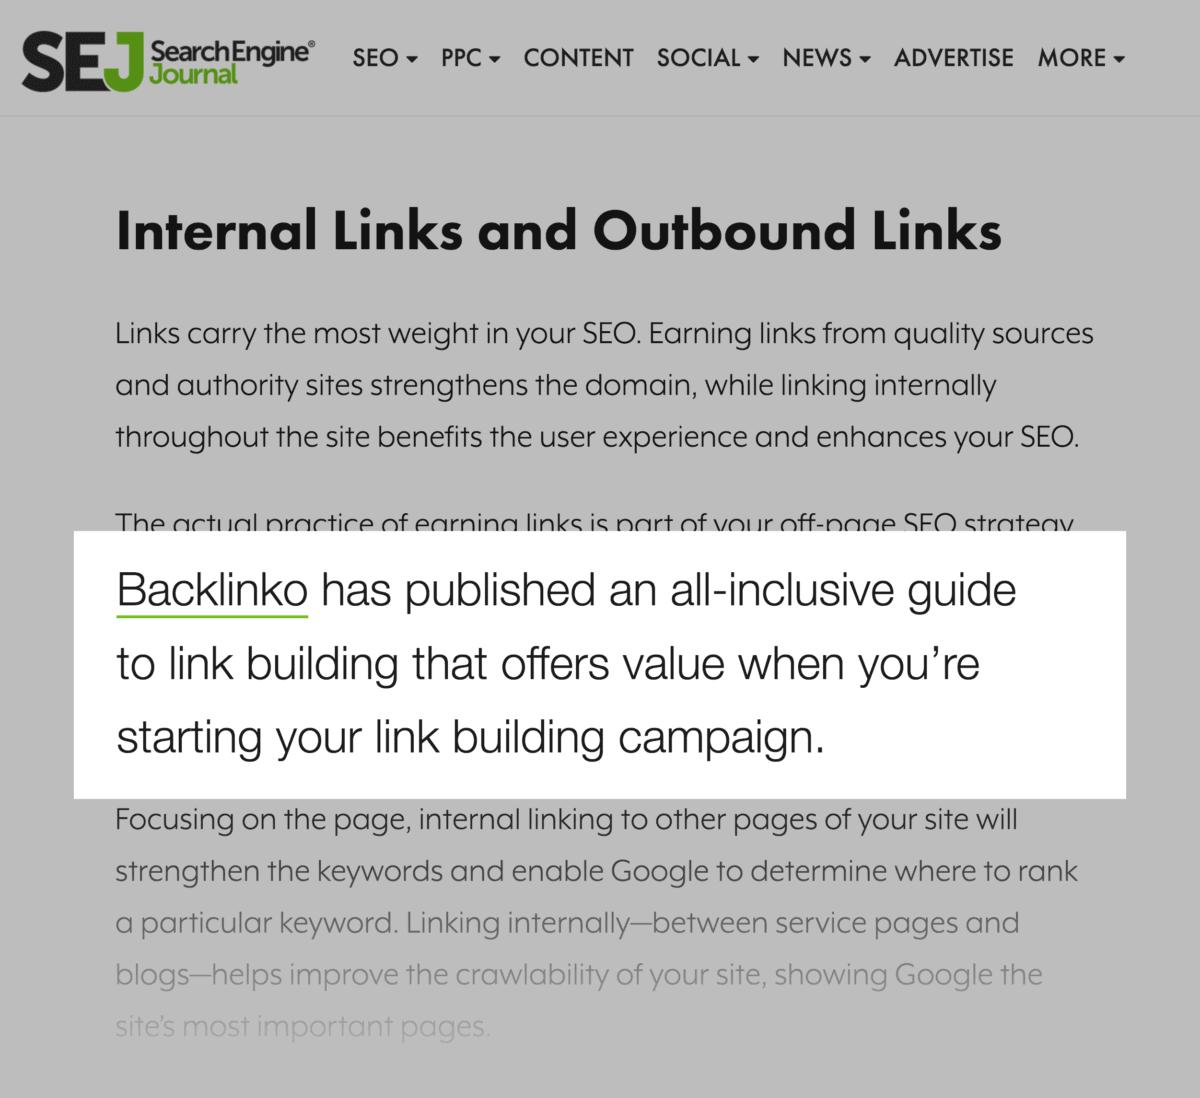 SEJ – Backlink to Backlinko